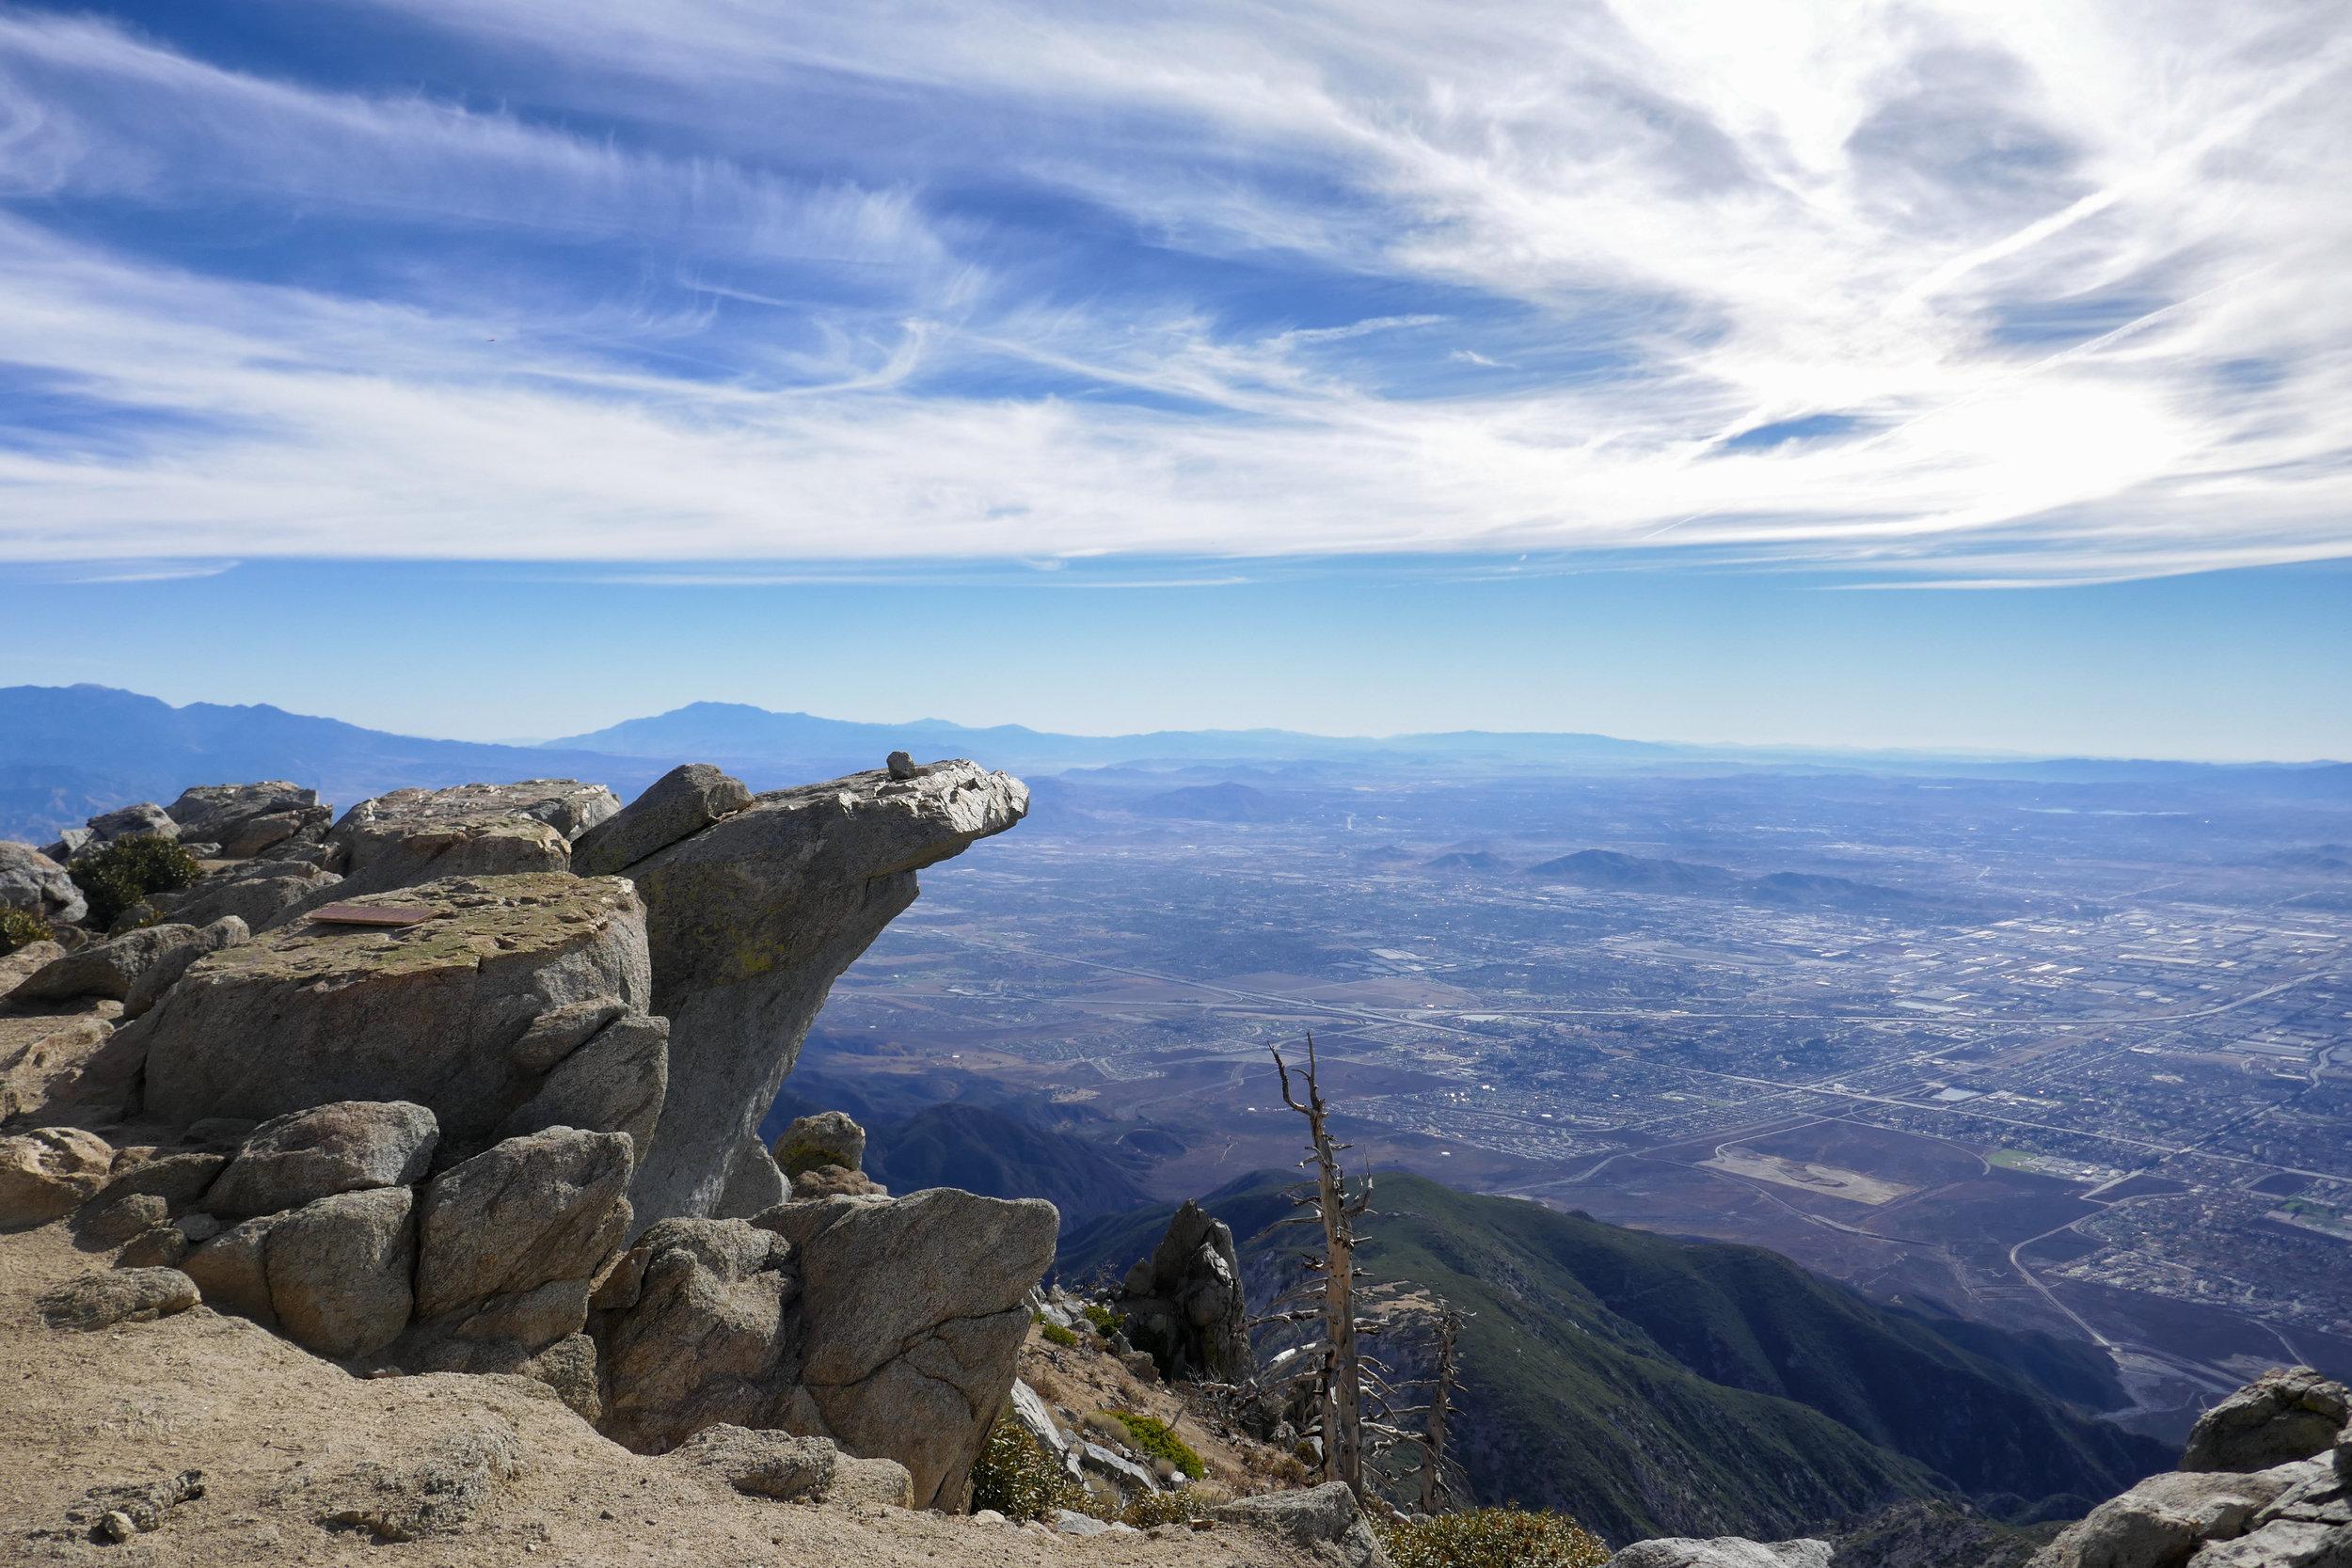 Views from Cucamonga Peak.